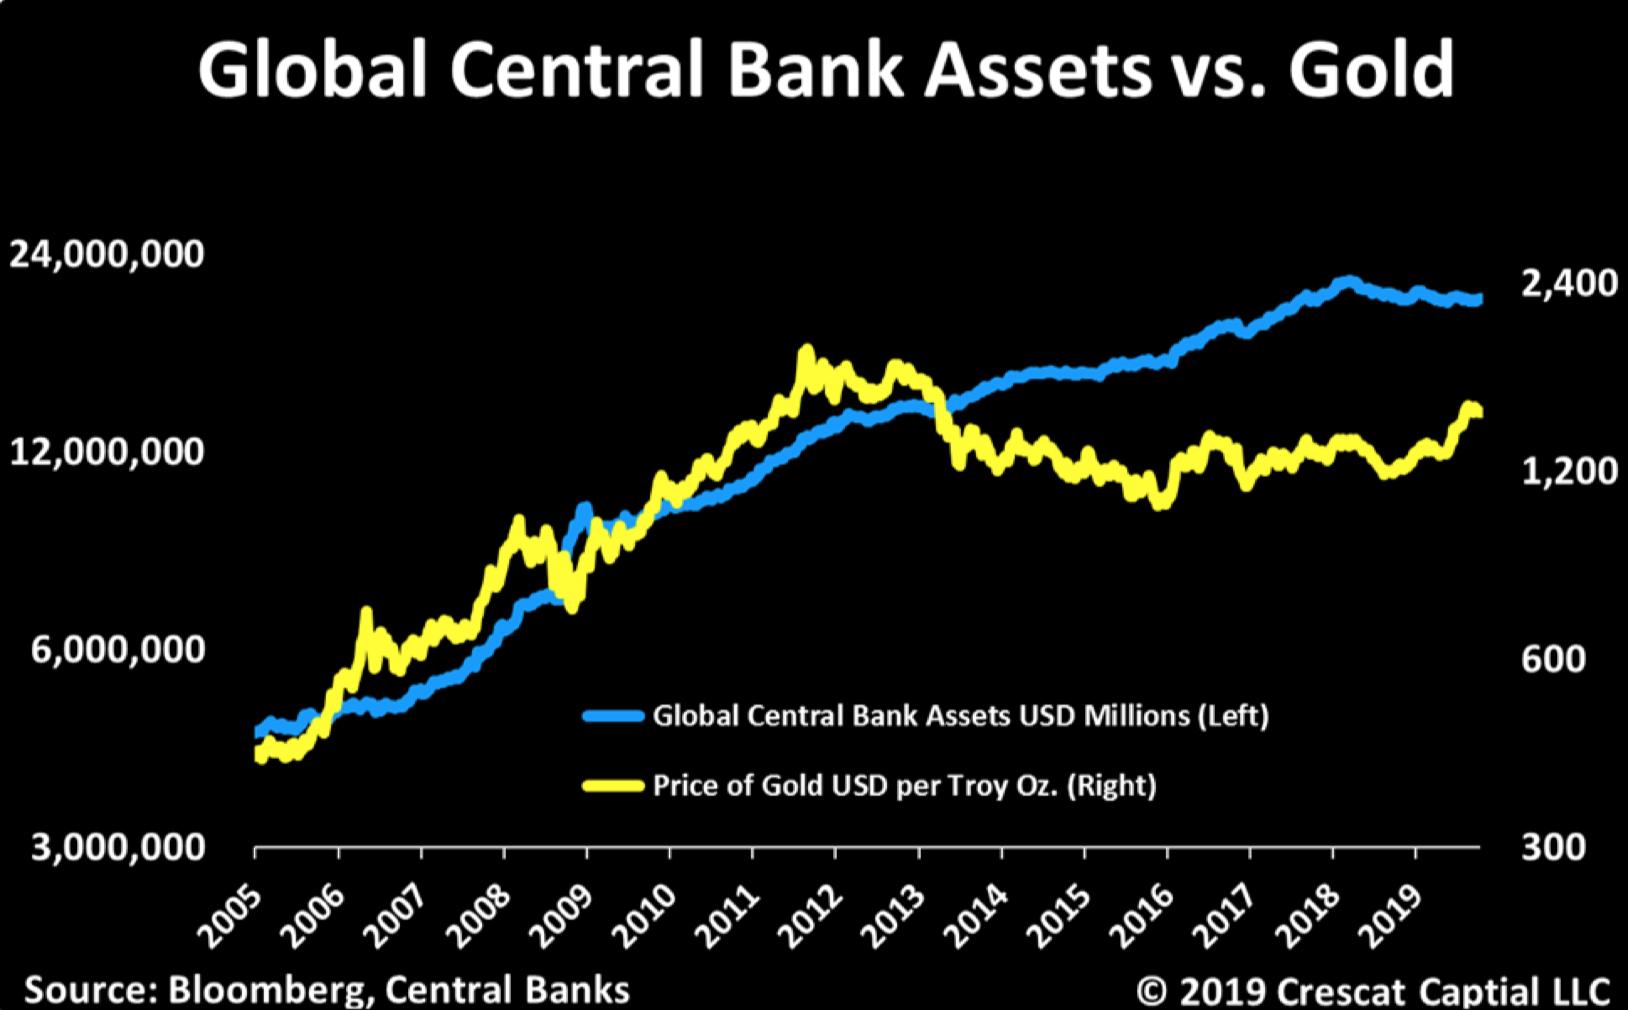 Global Central Bank Assets vs Gold - Quelle: Crescat Capital LLC